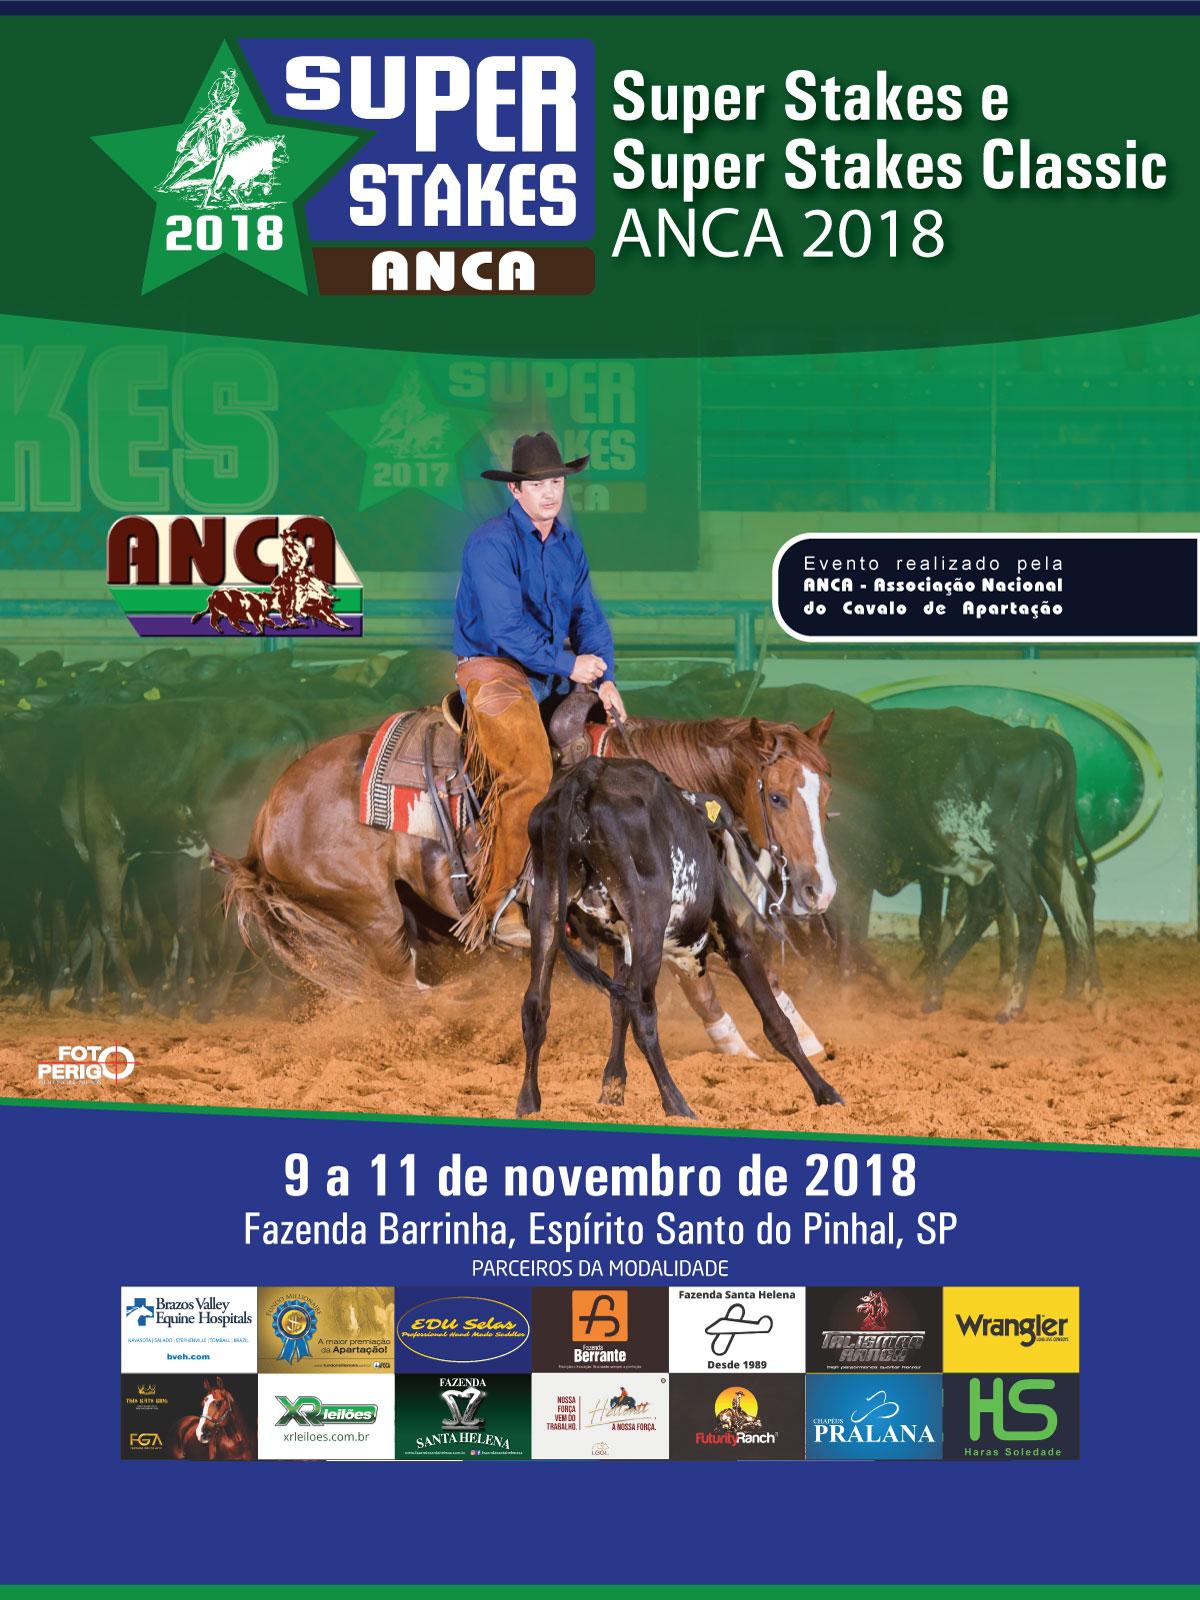 Super Stakes e Super Stakes Classic ANCA 2018